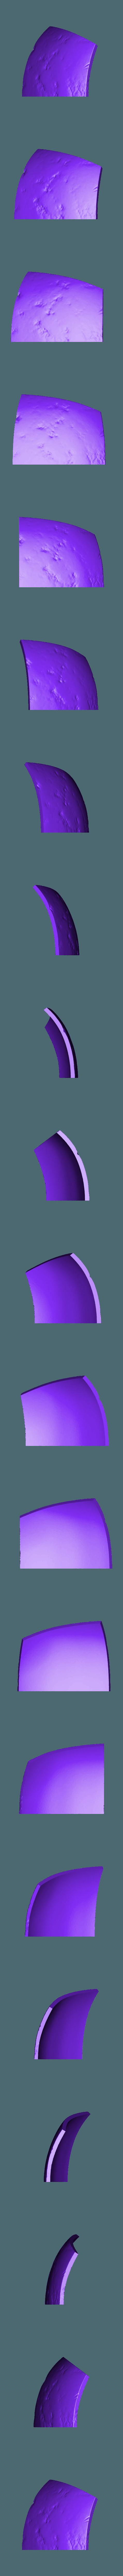 Armory_Damaged_Print15.obj Download OBJ file Armory - Knights of Ren Helmet (damaged), 3D print model • 3D print design, 3D-mon